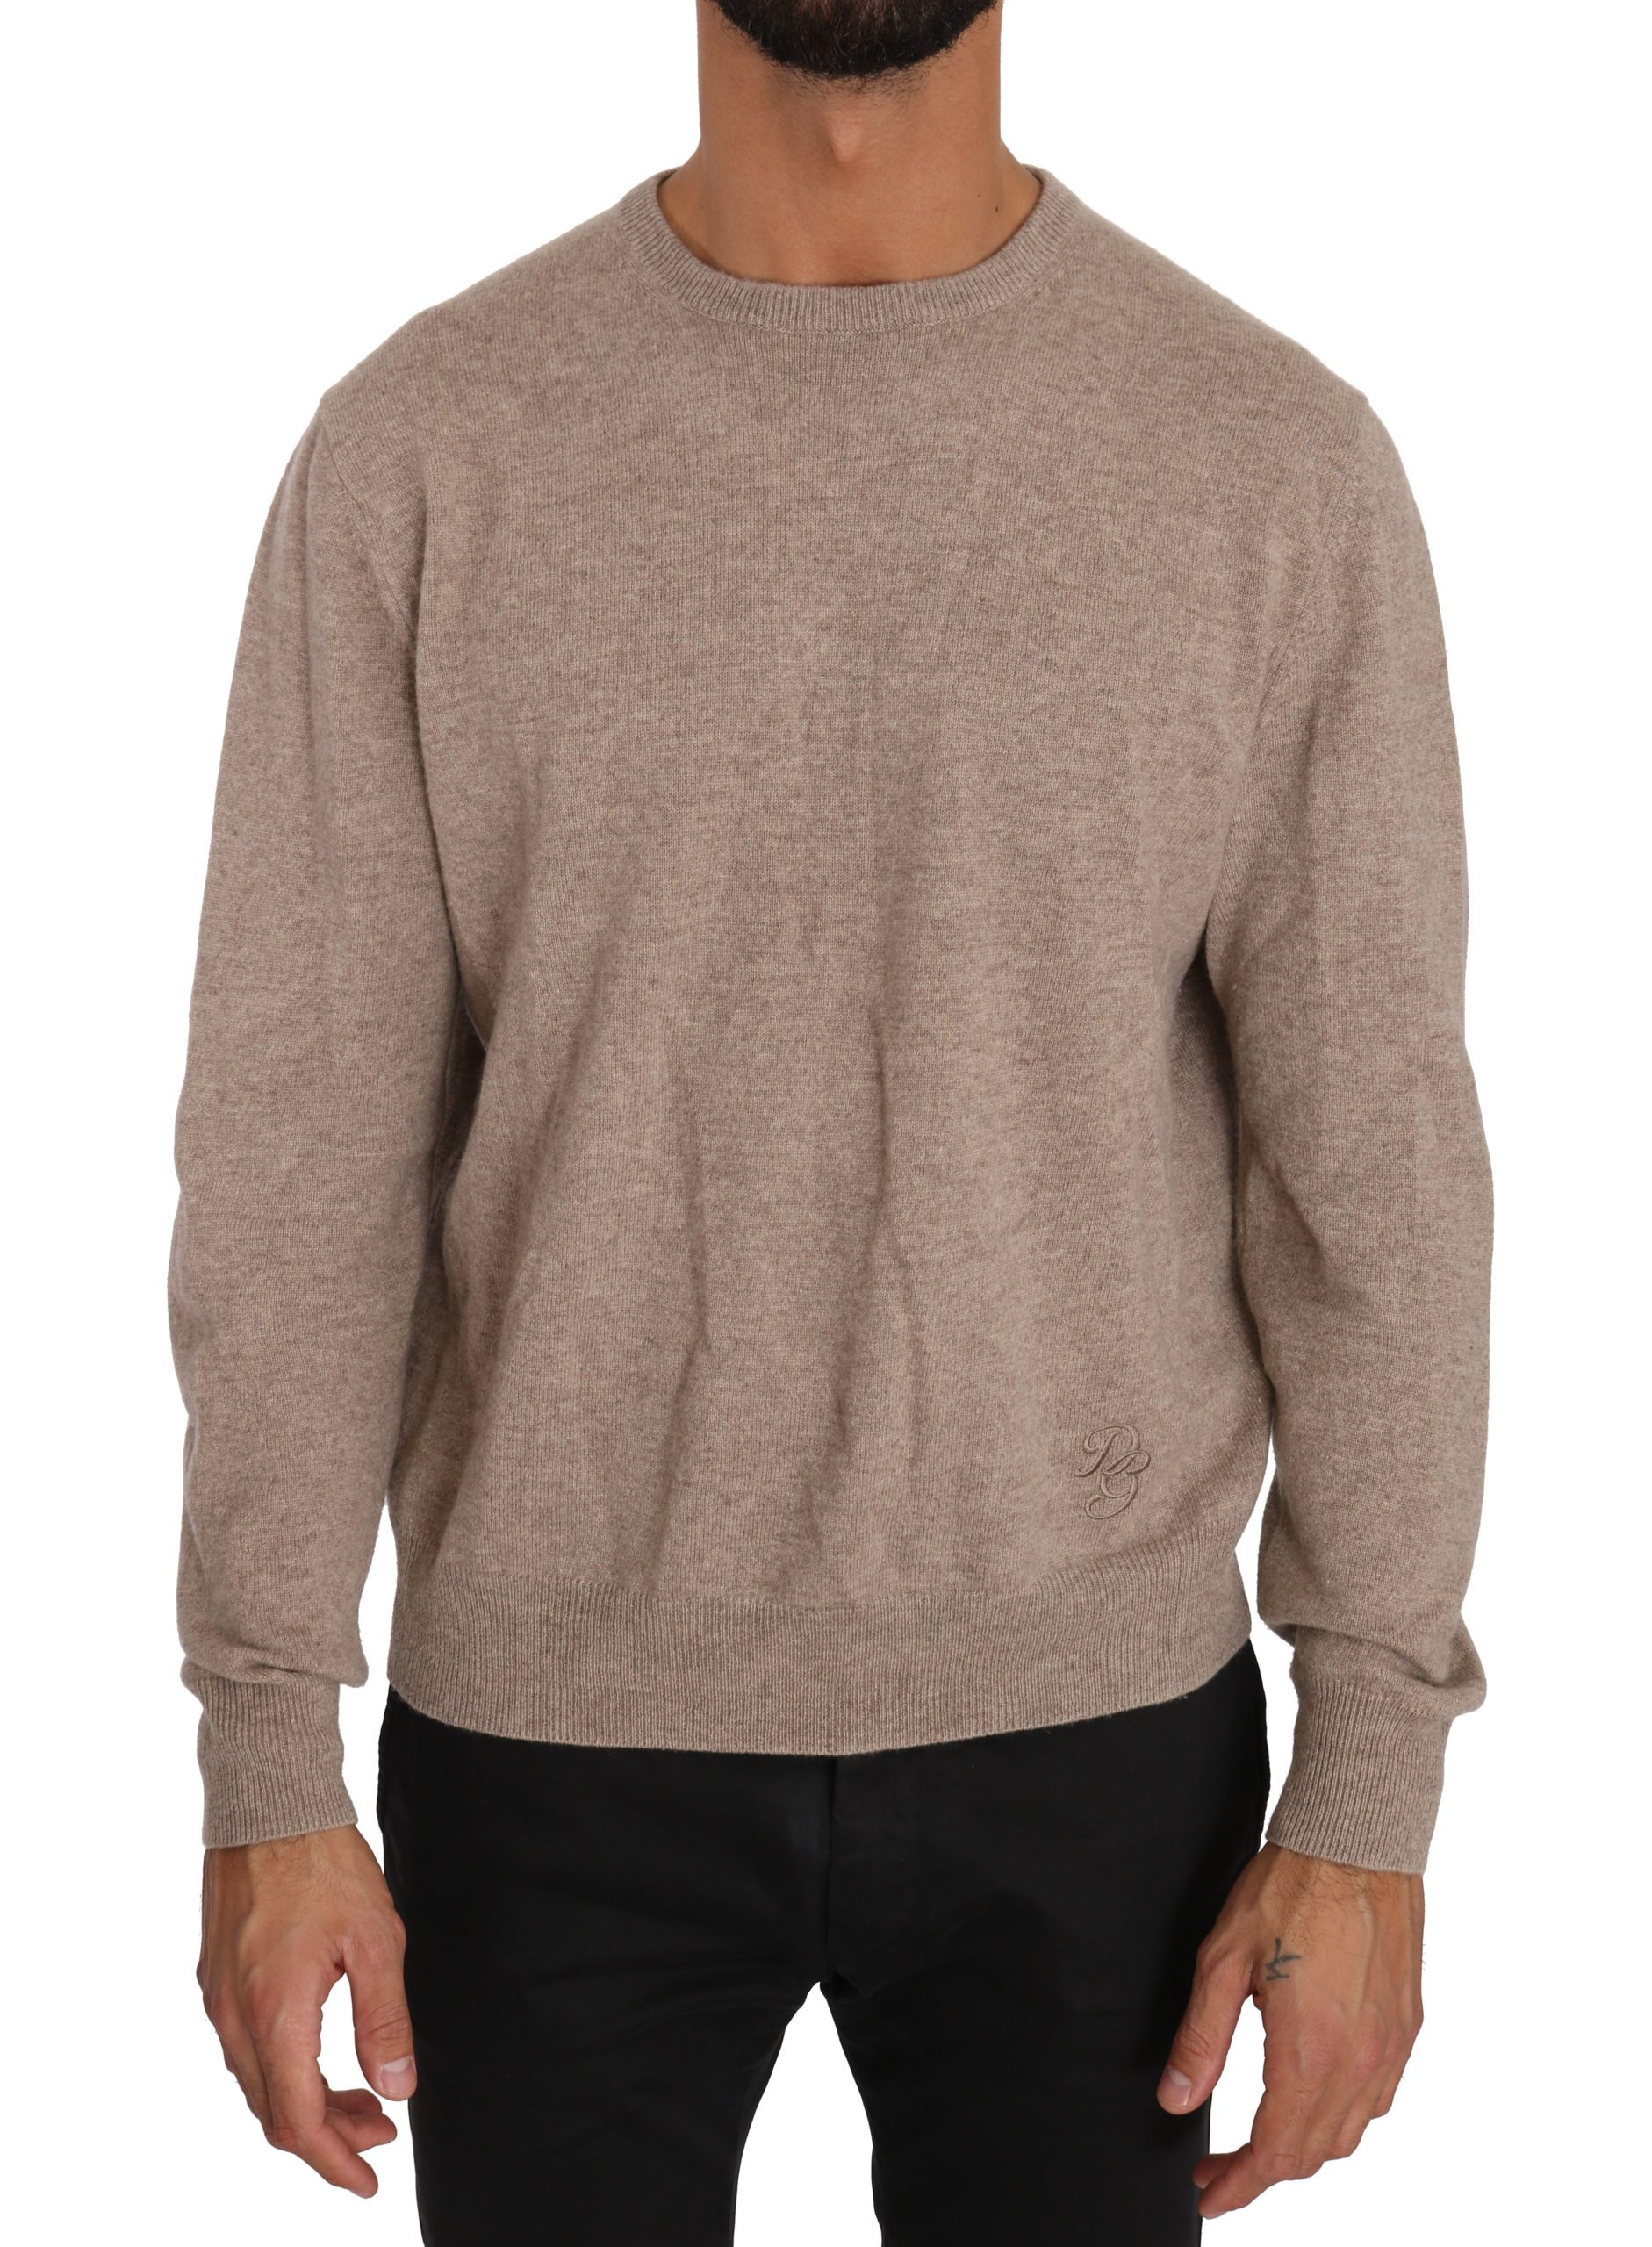 Dolce & Gabbana Men's Wool Cashmere DG Logo Pullover Sweater Beige TSH2726 - IT50 | L